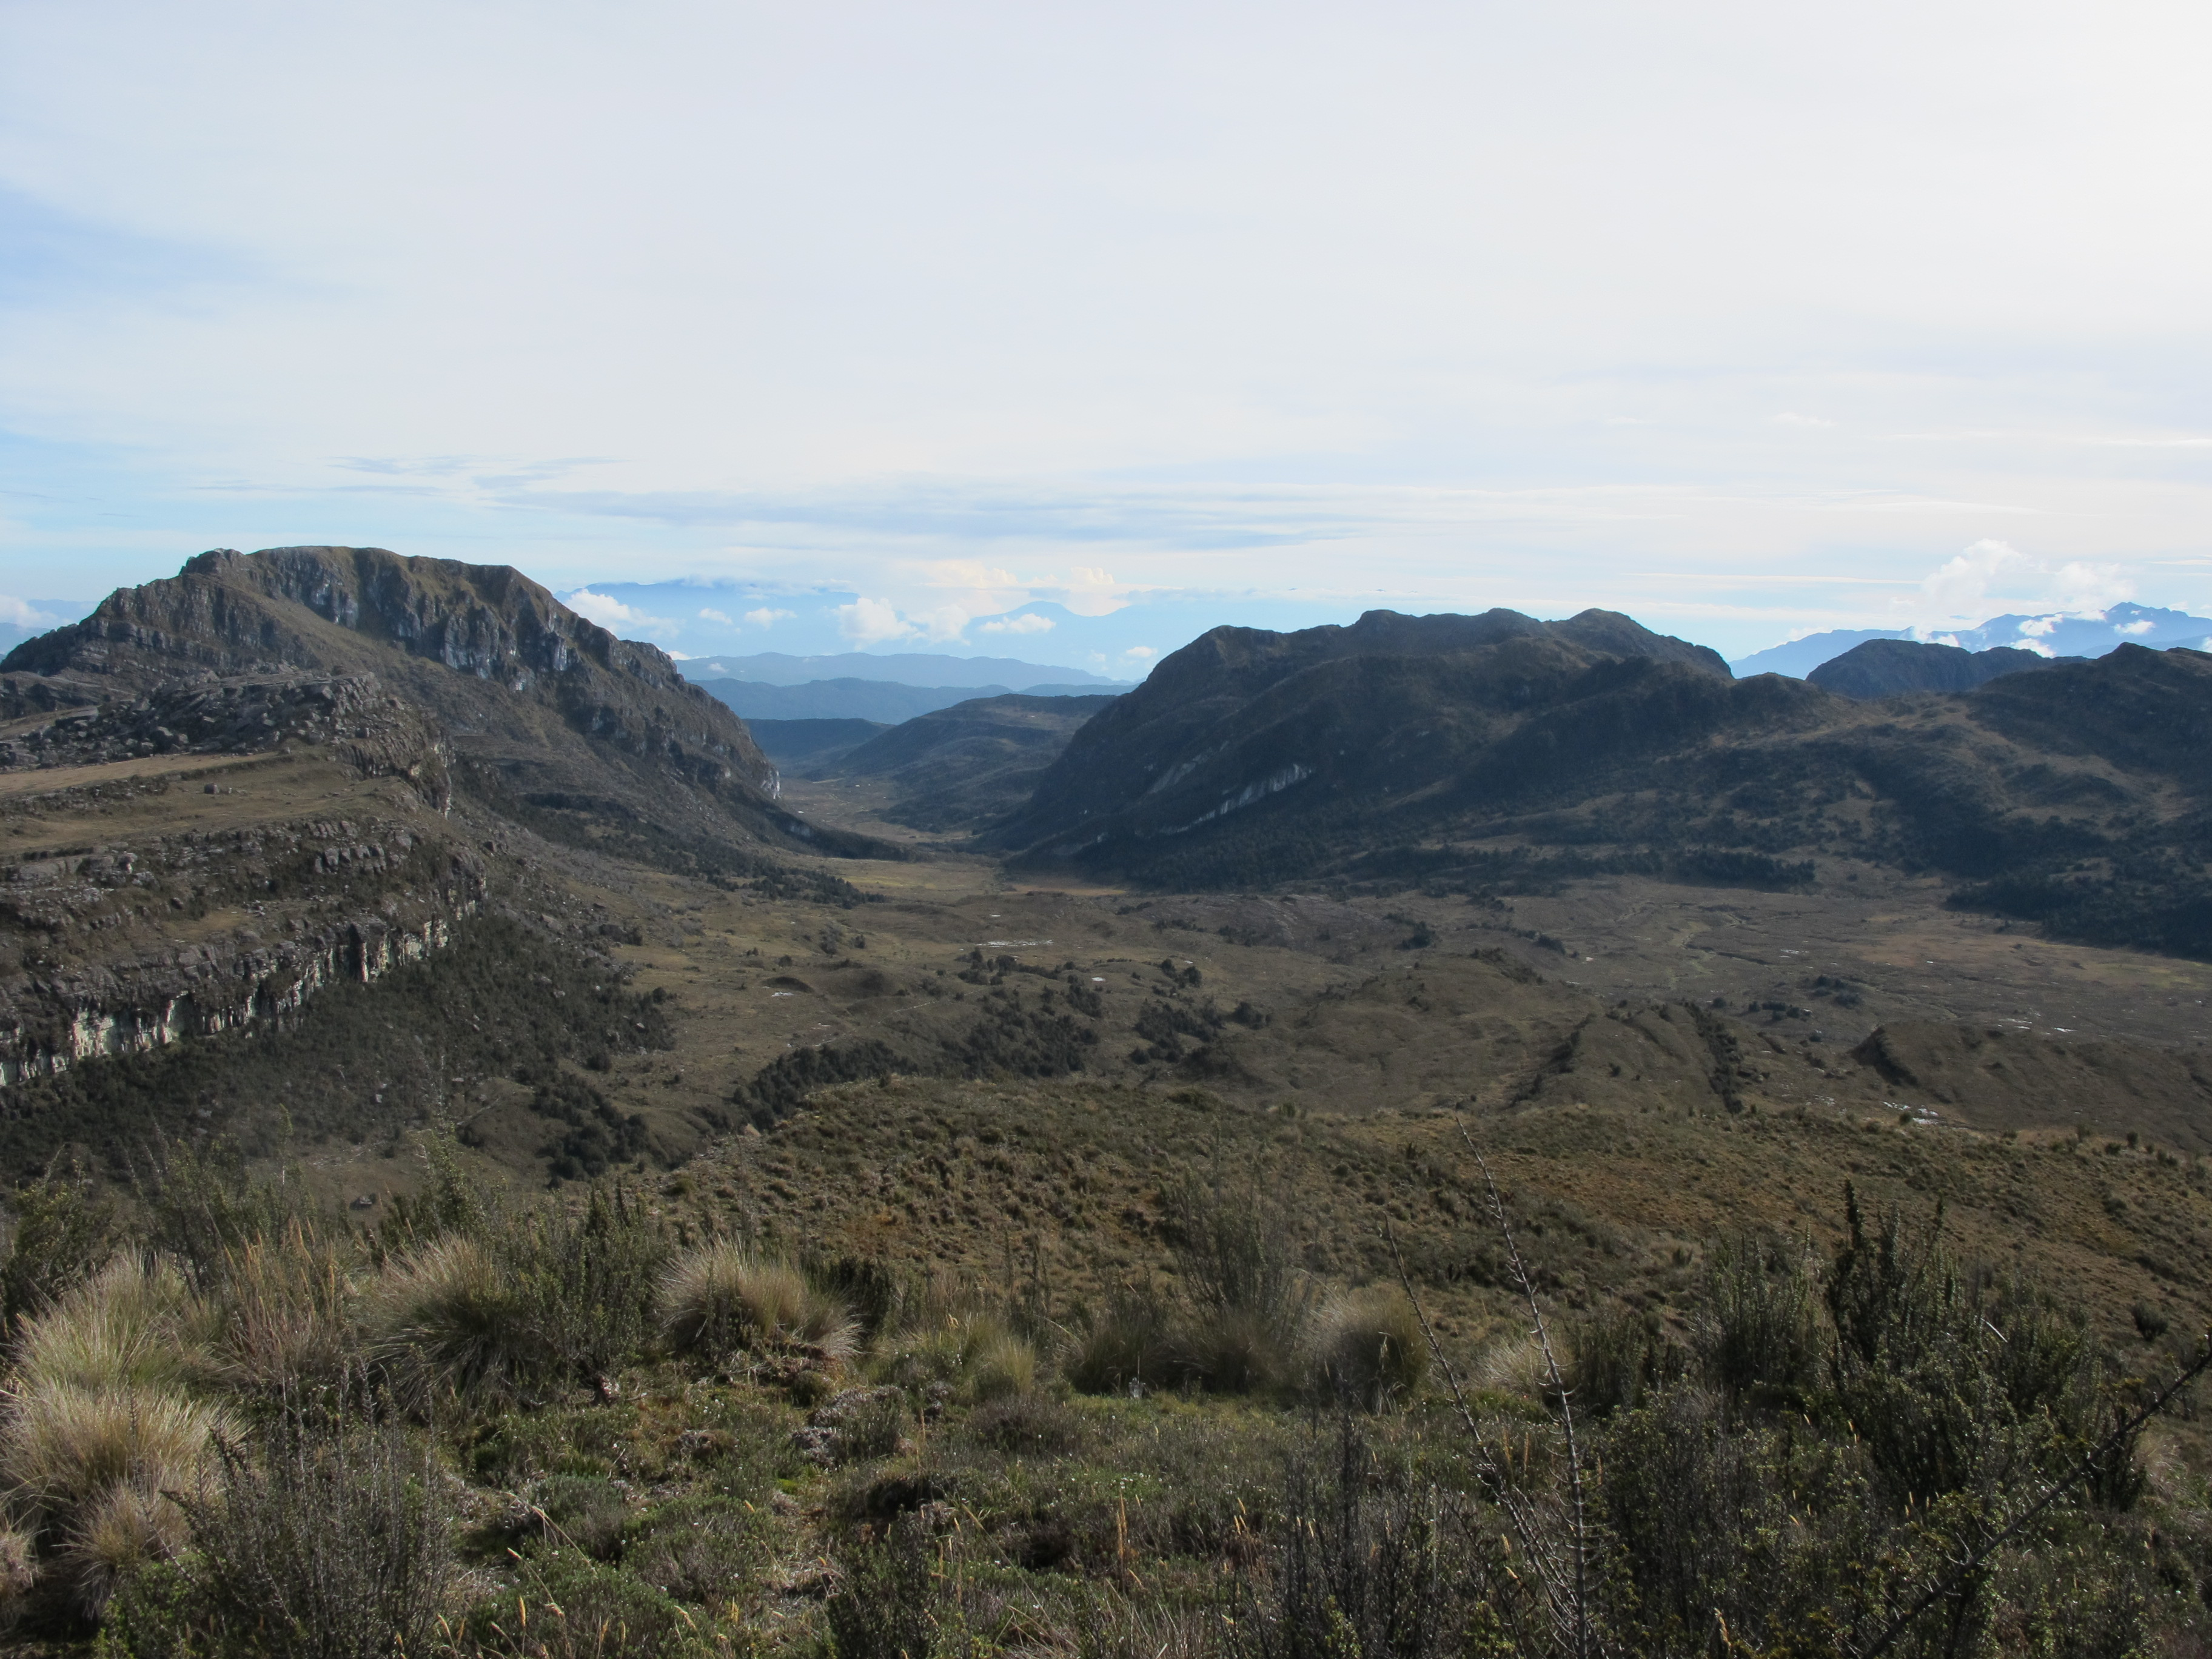 30 Nov 2010 View back towards cave camp and Lake Habbema from Trikora flank